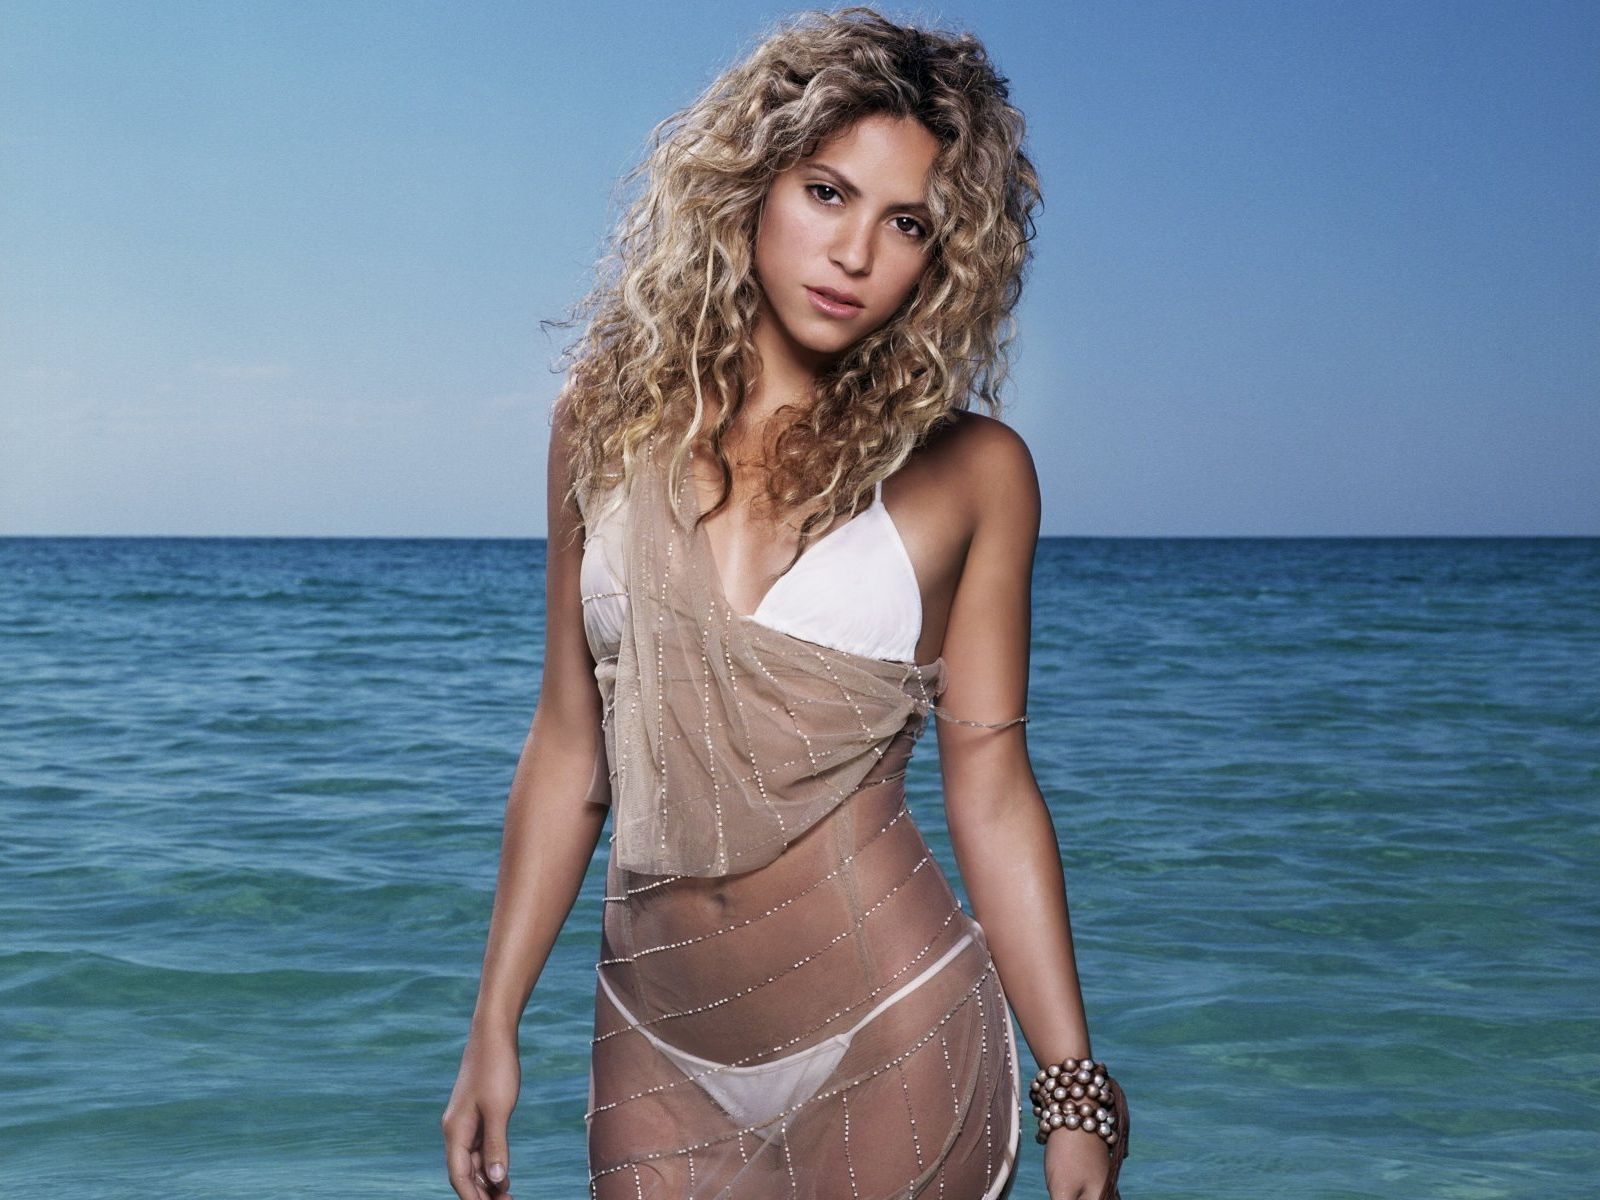 La dieta secreta de Shakira para lucir un cuerpo espectacular